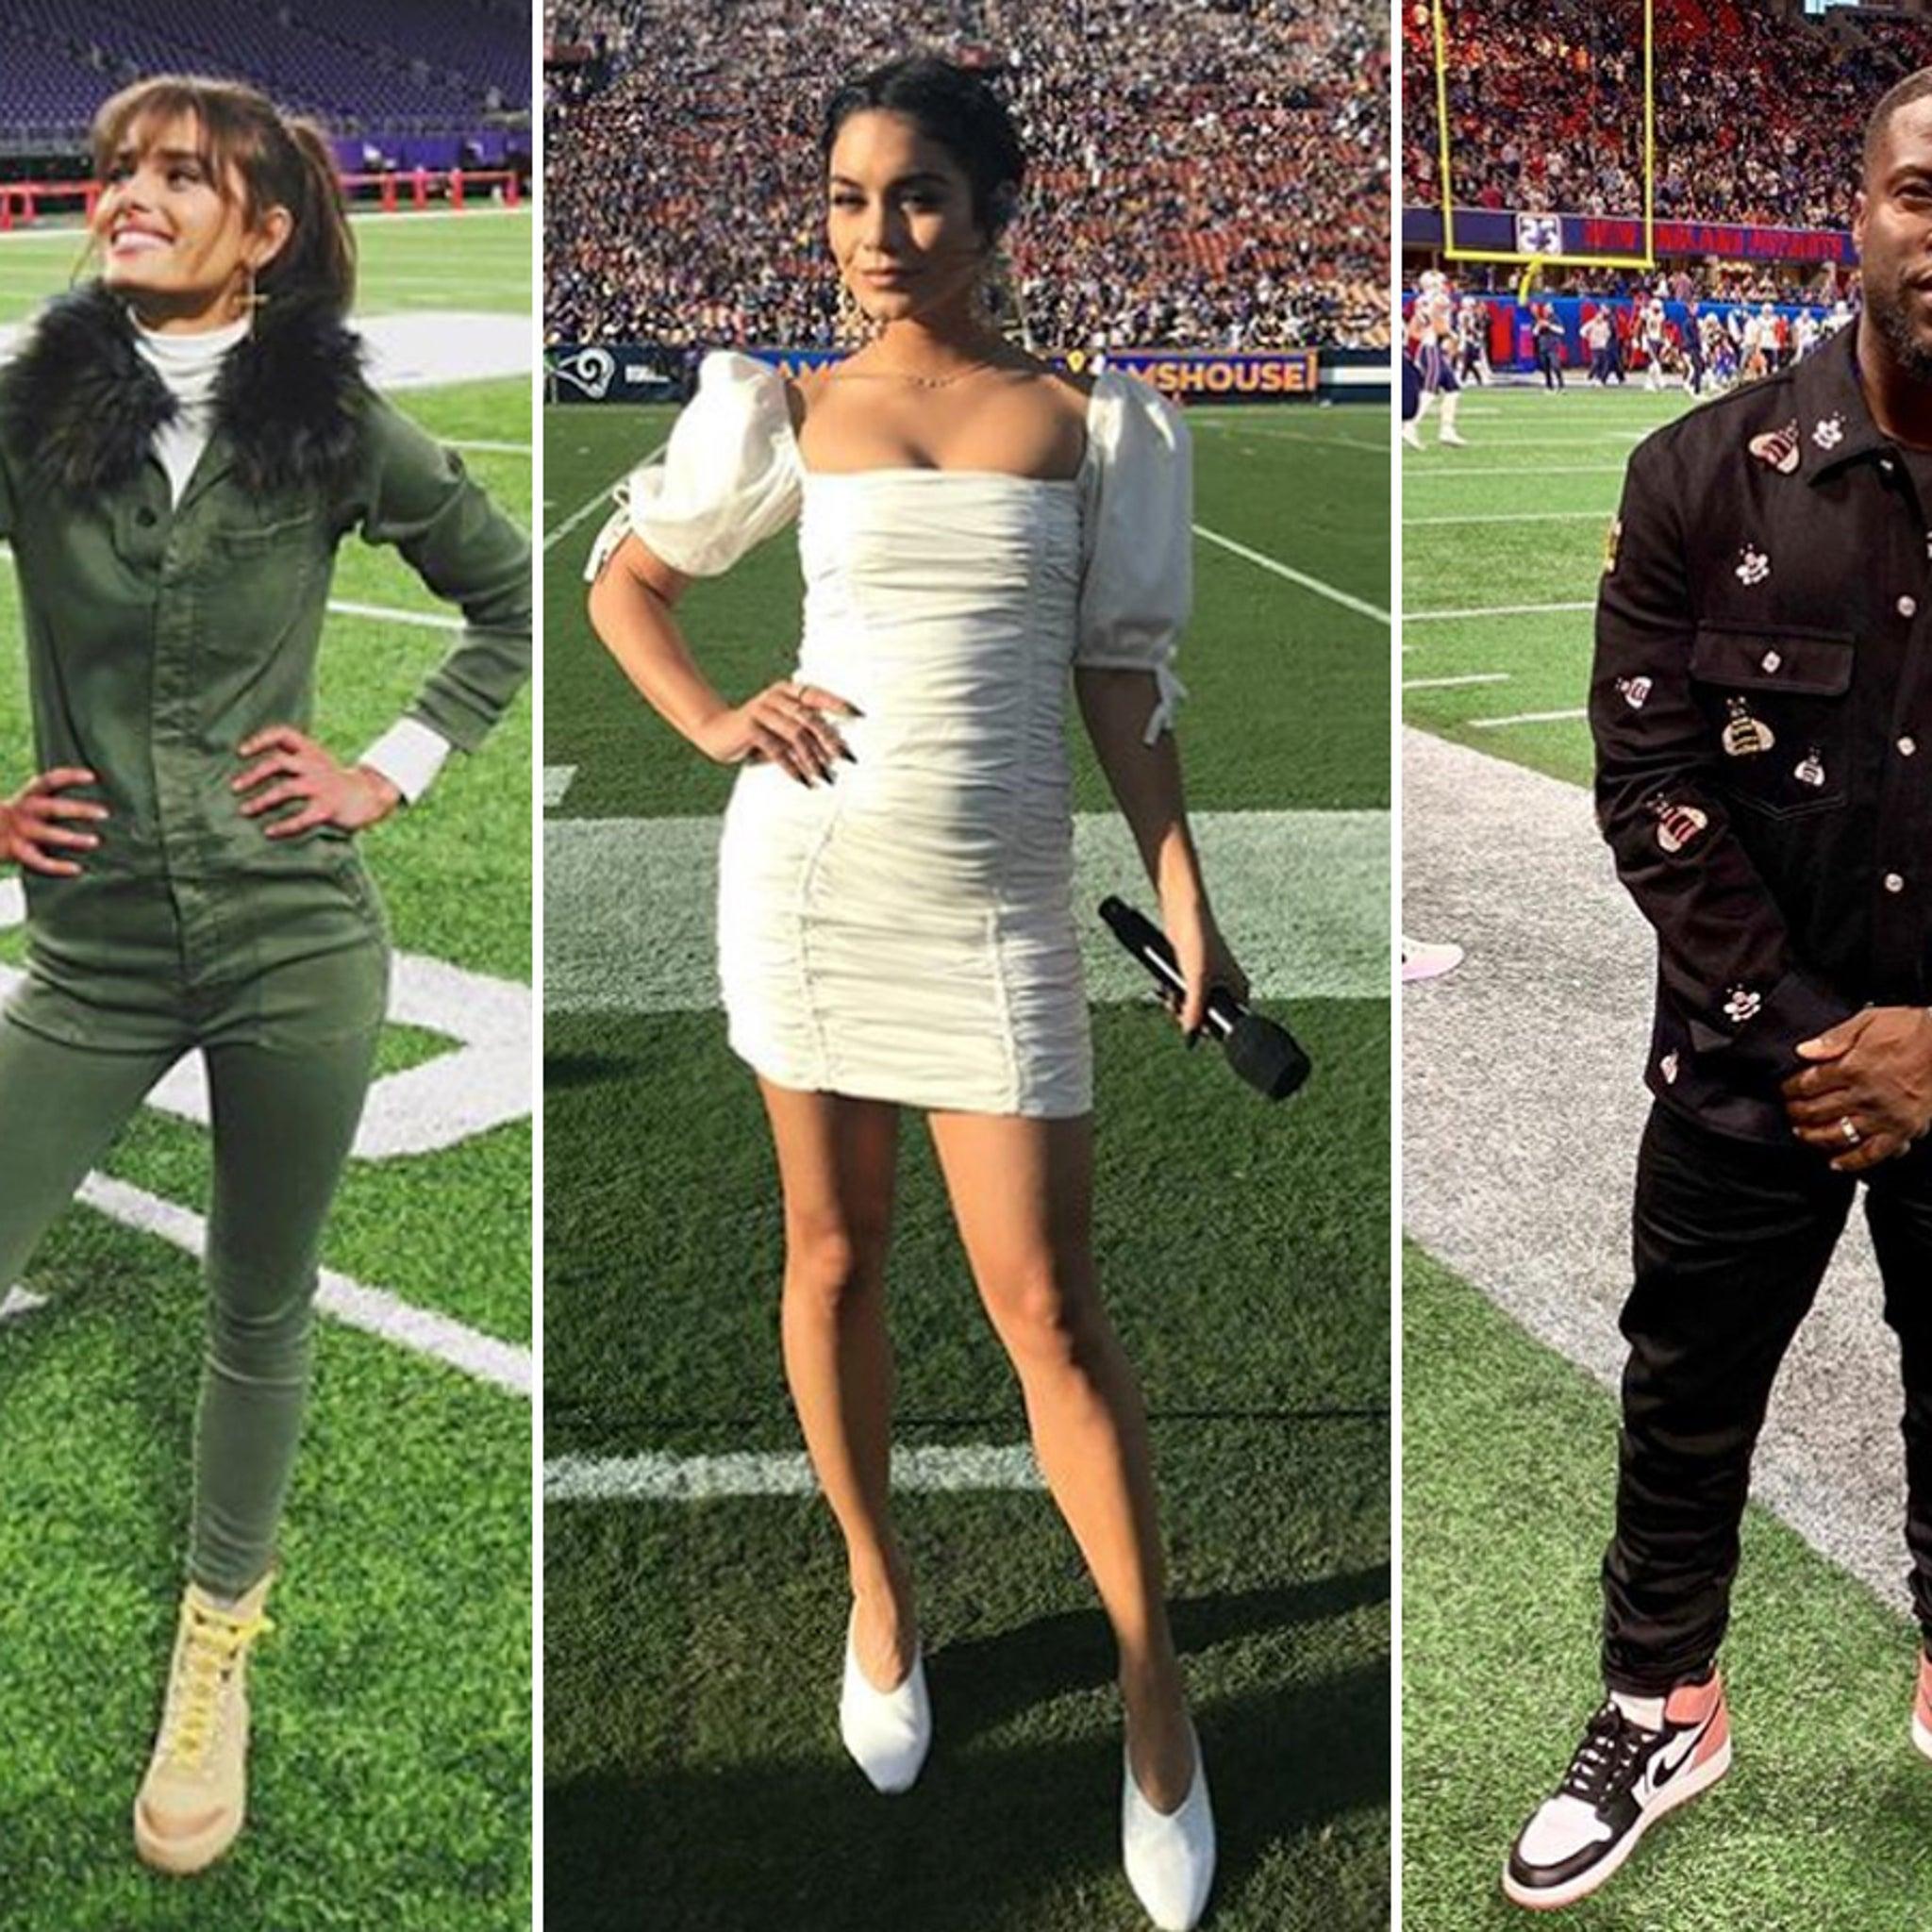 Famous NFL Fans Having A Field Day!